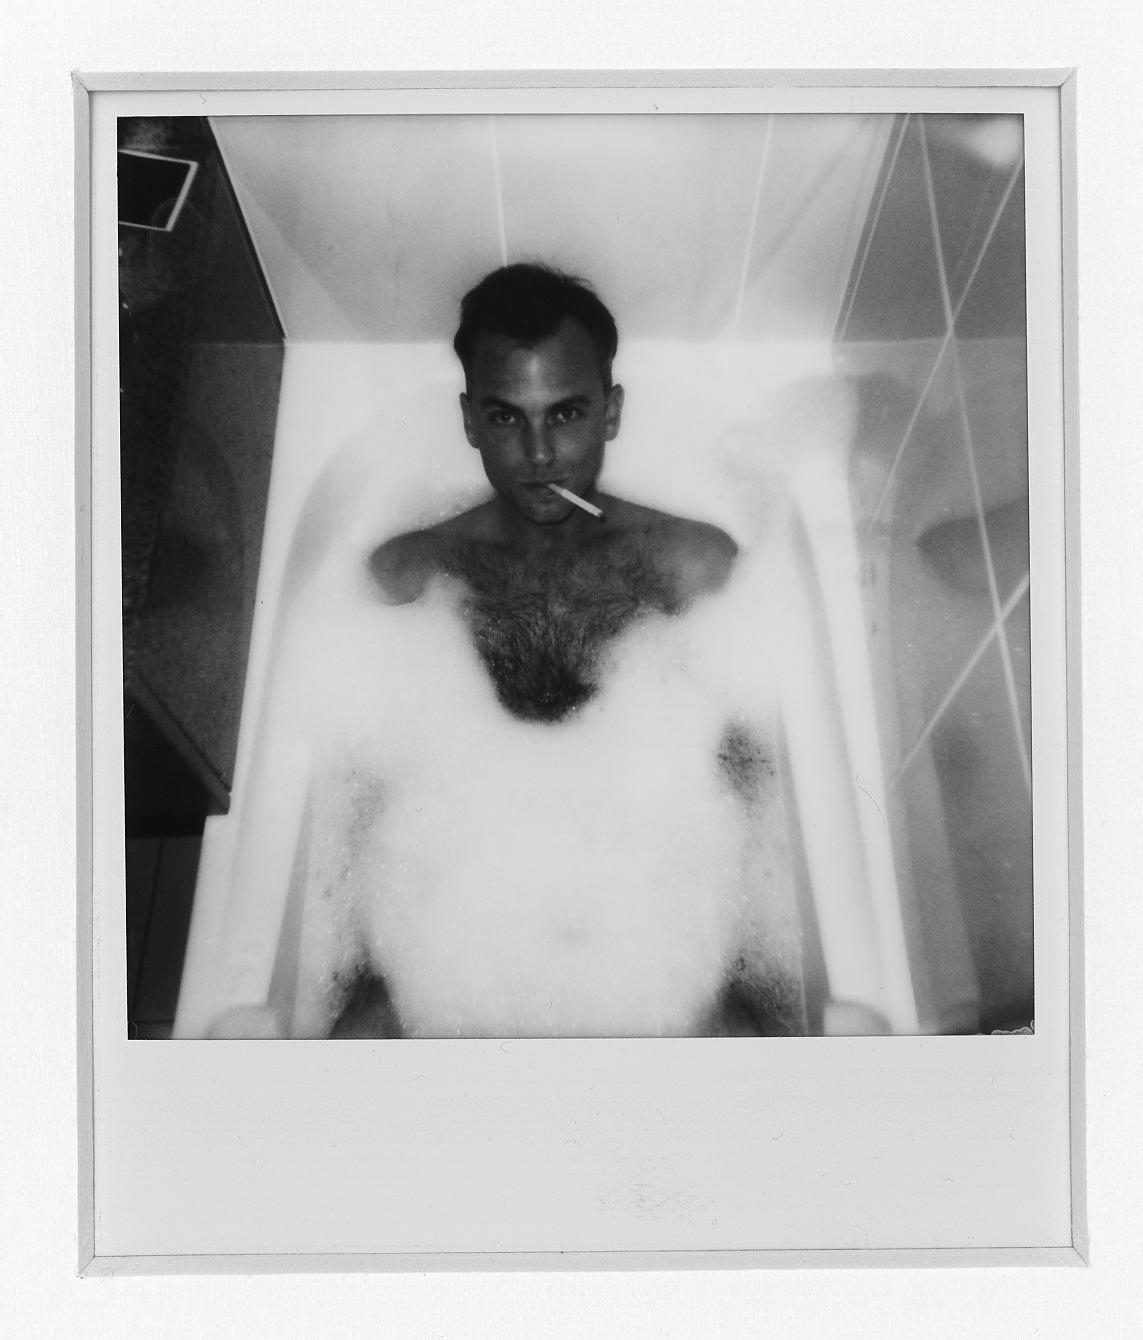 gioia de bruijn photography interview